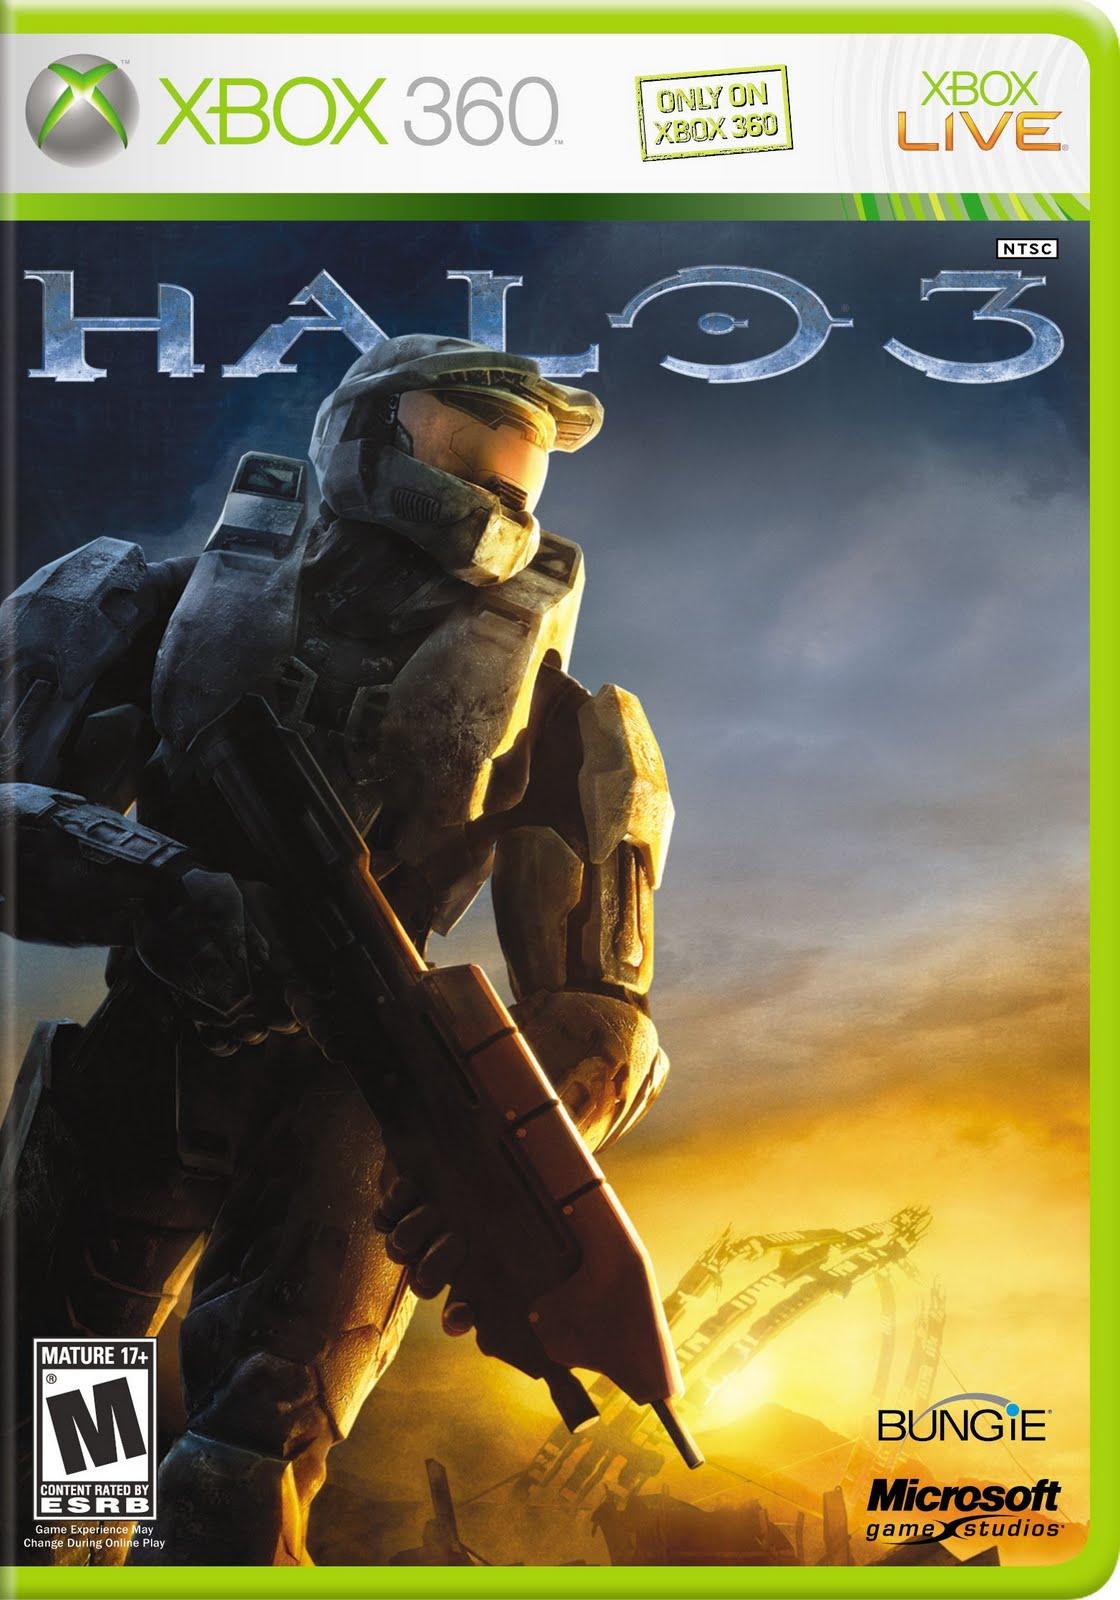 Halo 3 [Xbox360 Game] 6,7GB - Mediafire - Download Games ...